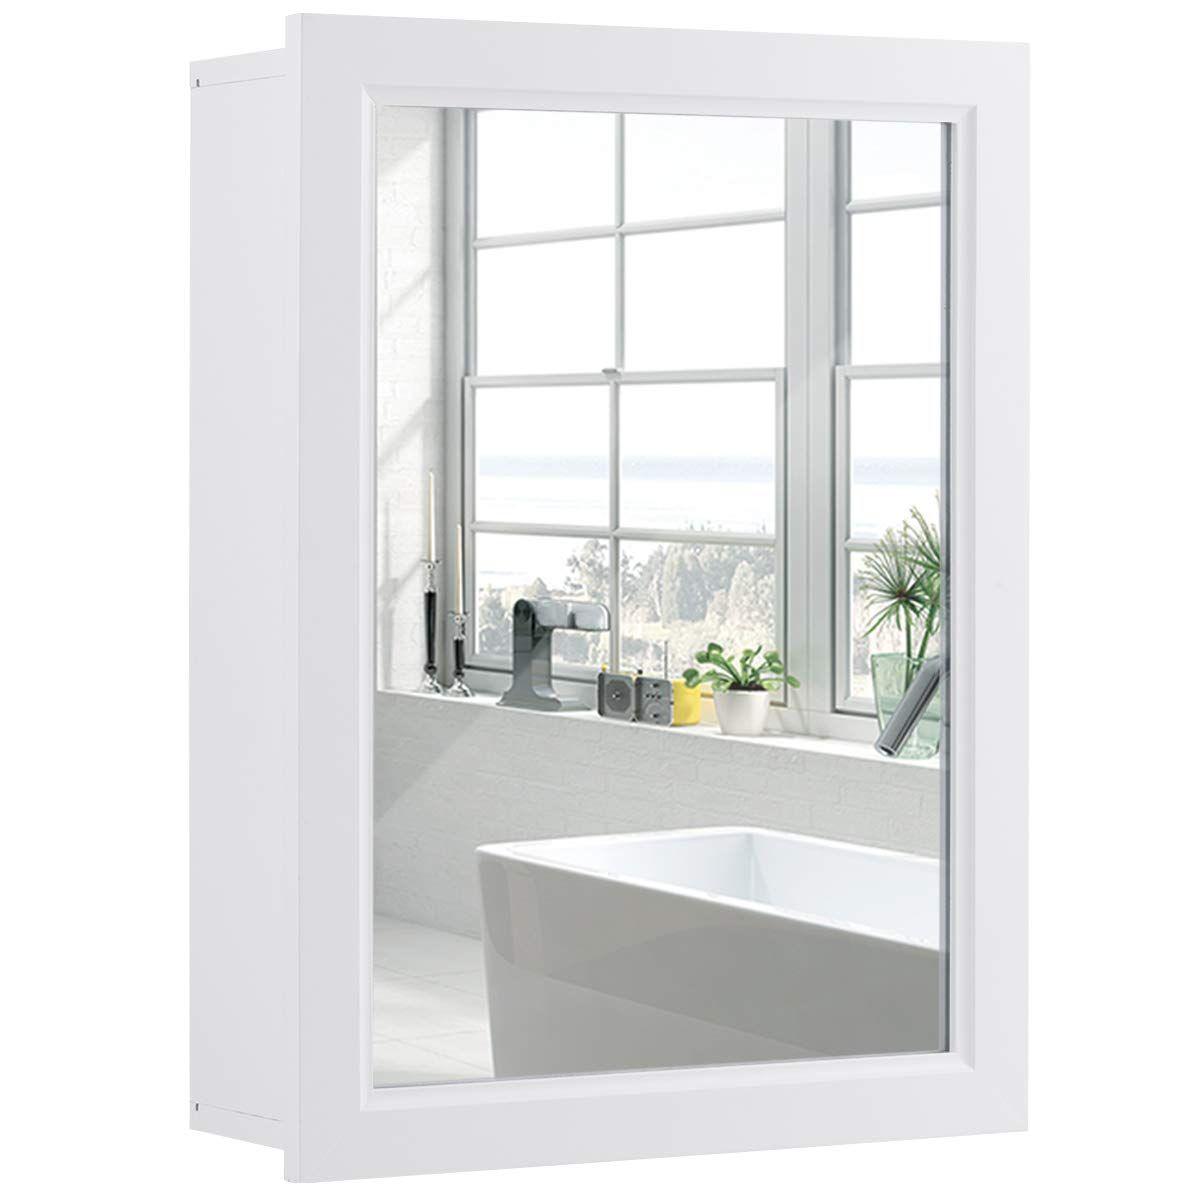 Tangkula Mirrored Bathroom Cabinet, Wall Mount Storage ...